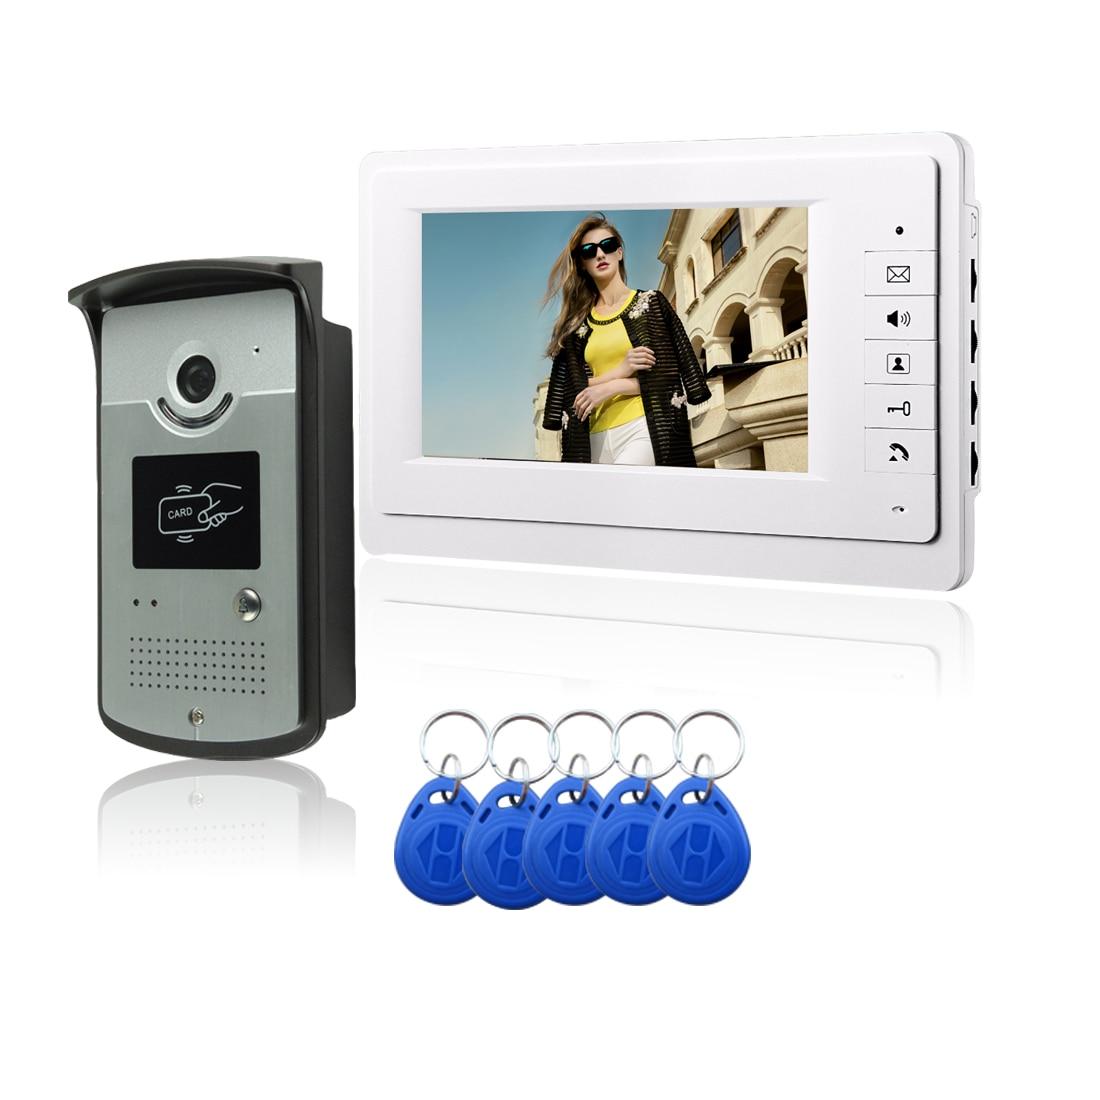 816MEID11 Direct Factory 7Video Door Intercom Camera Access Controller For Security